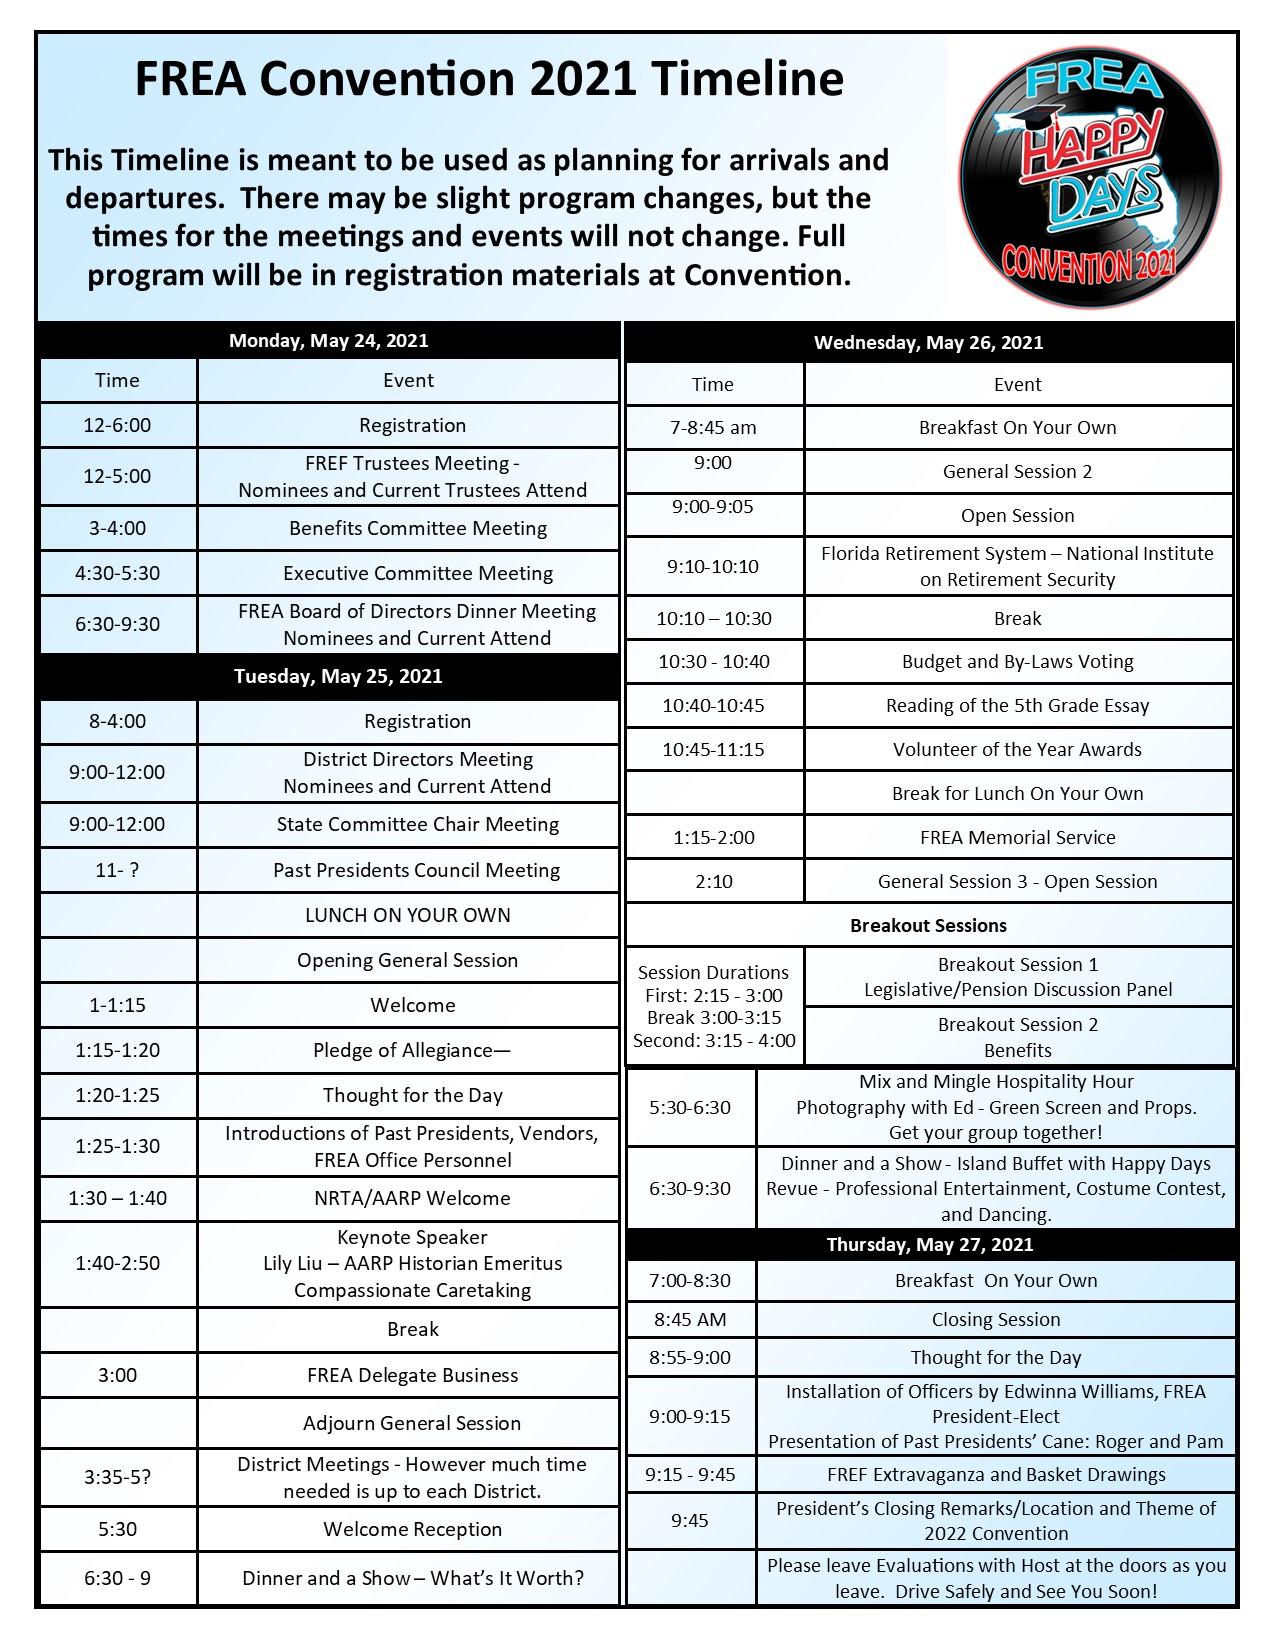 FREA 2021 Convention Timeline Website